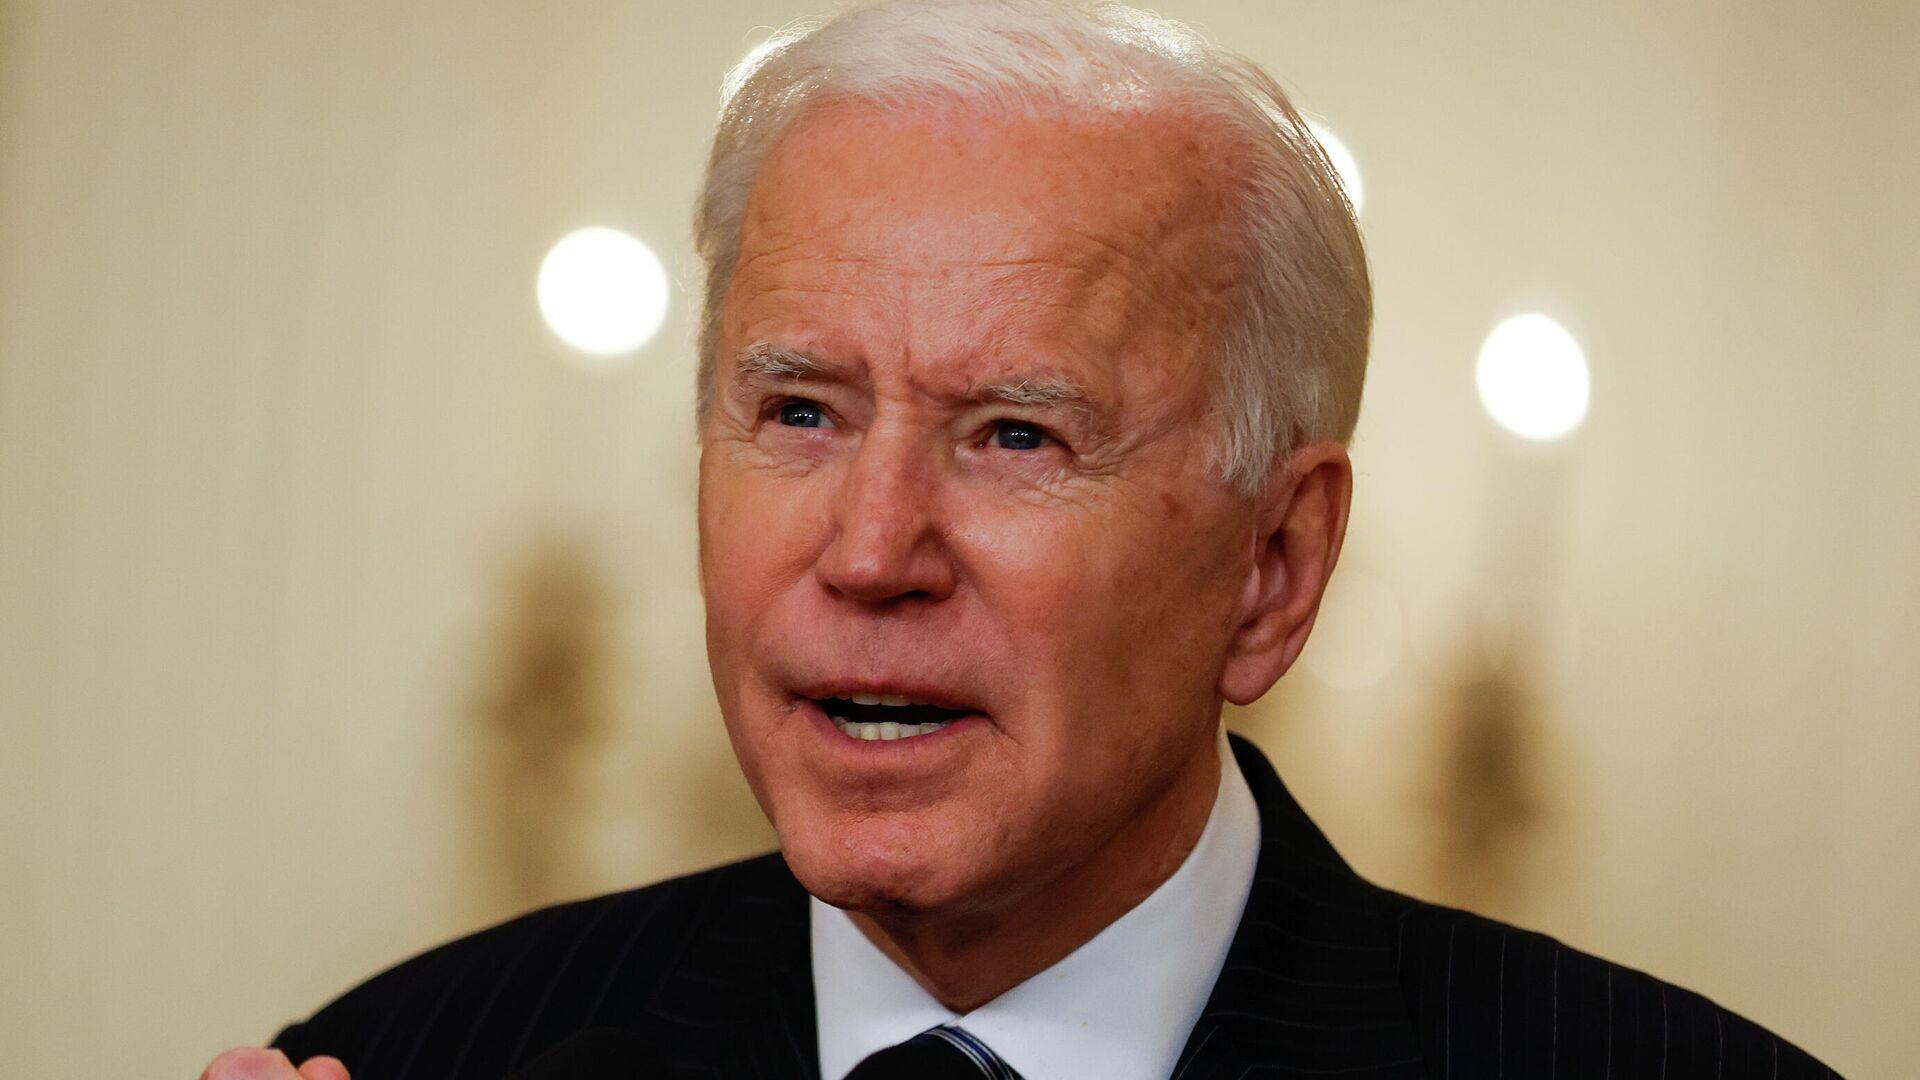 Joe Biden, presidente de EEUU - Sputnik Mundo, 1920, 30.03.2021